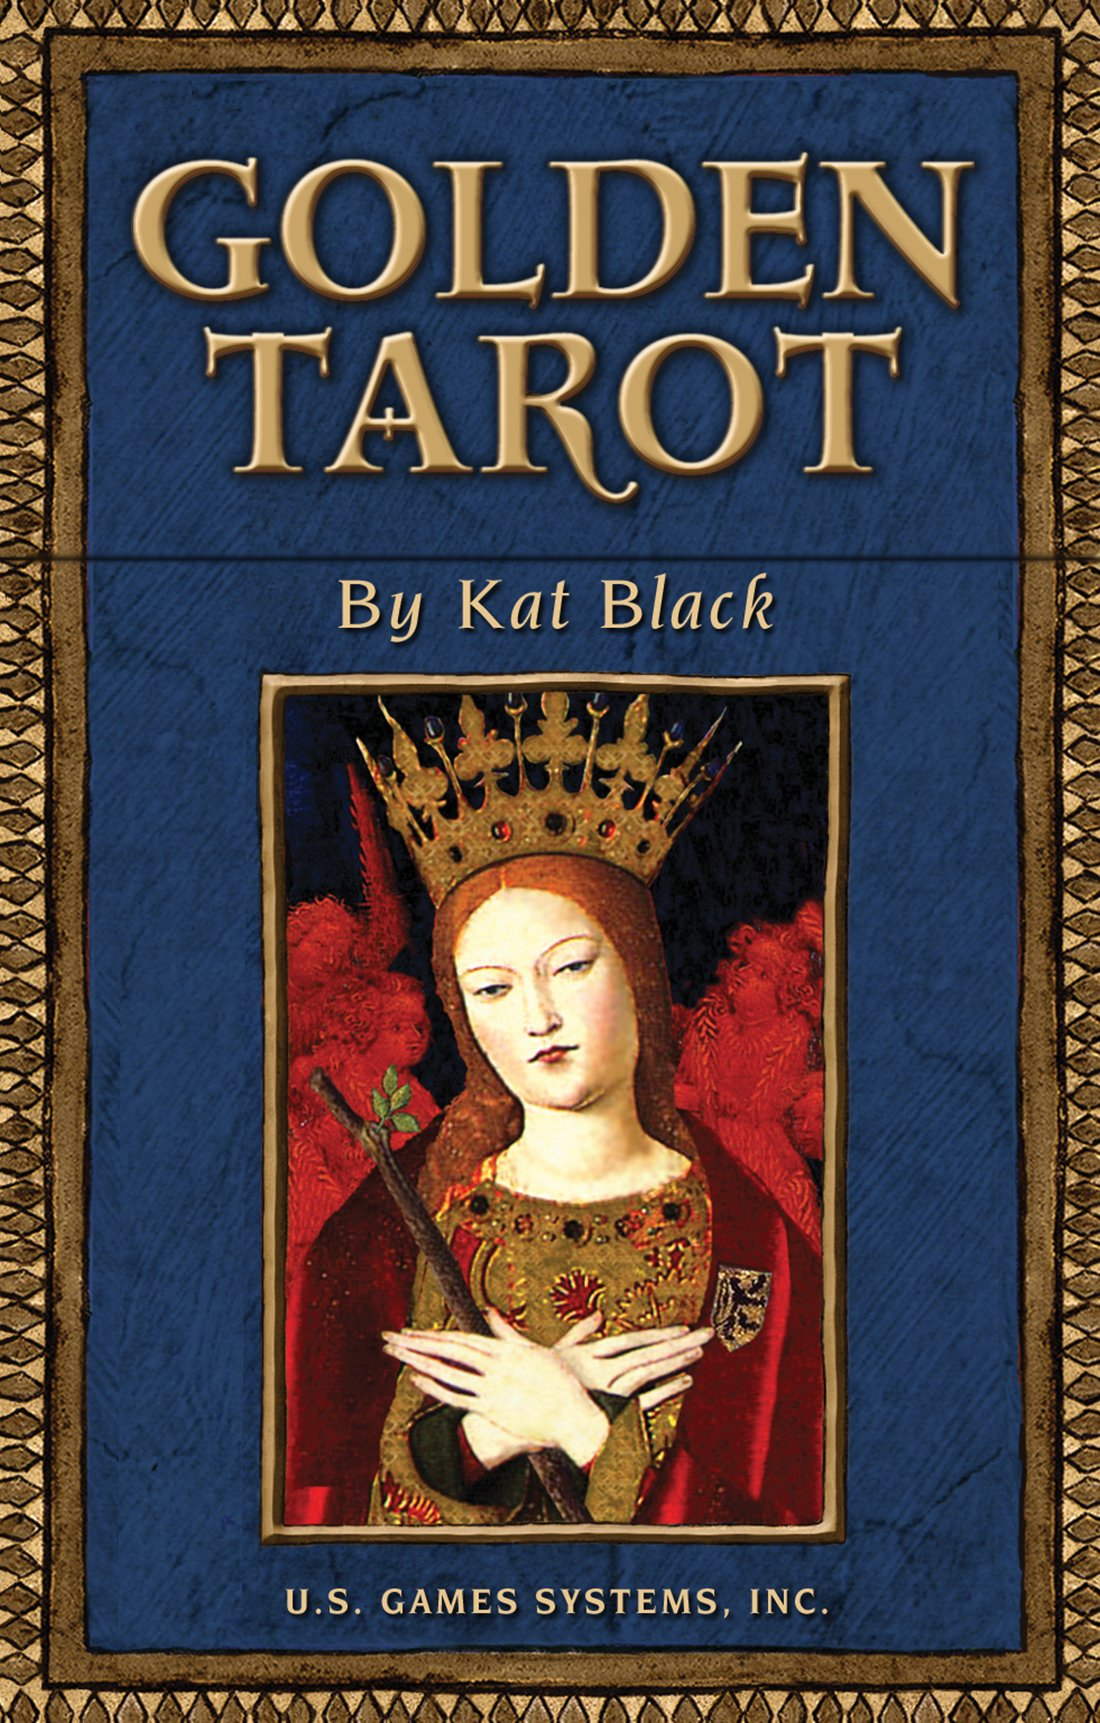 Golden Tarot (Inglés) Cartas – Edición coleccionista, 19 mar 2004 Kat Black U.S. Games 1572814349 Divination - Tarot